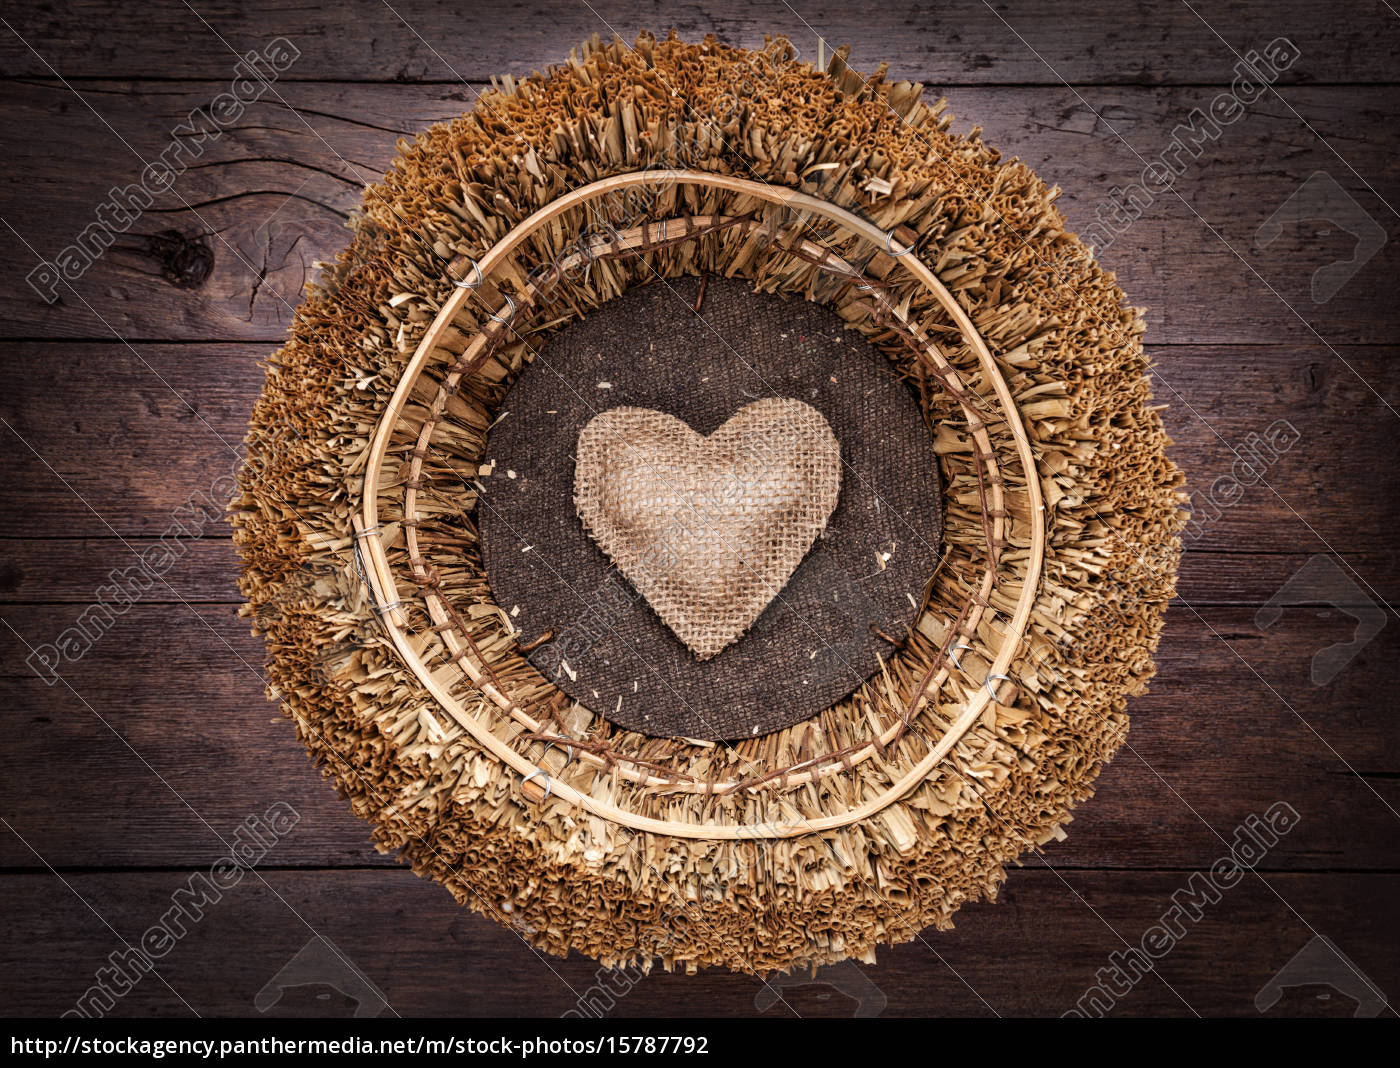 a, single, heart, inside, a, basket - 15787792